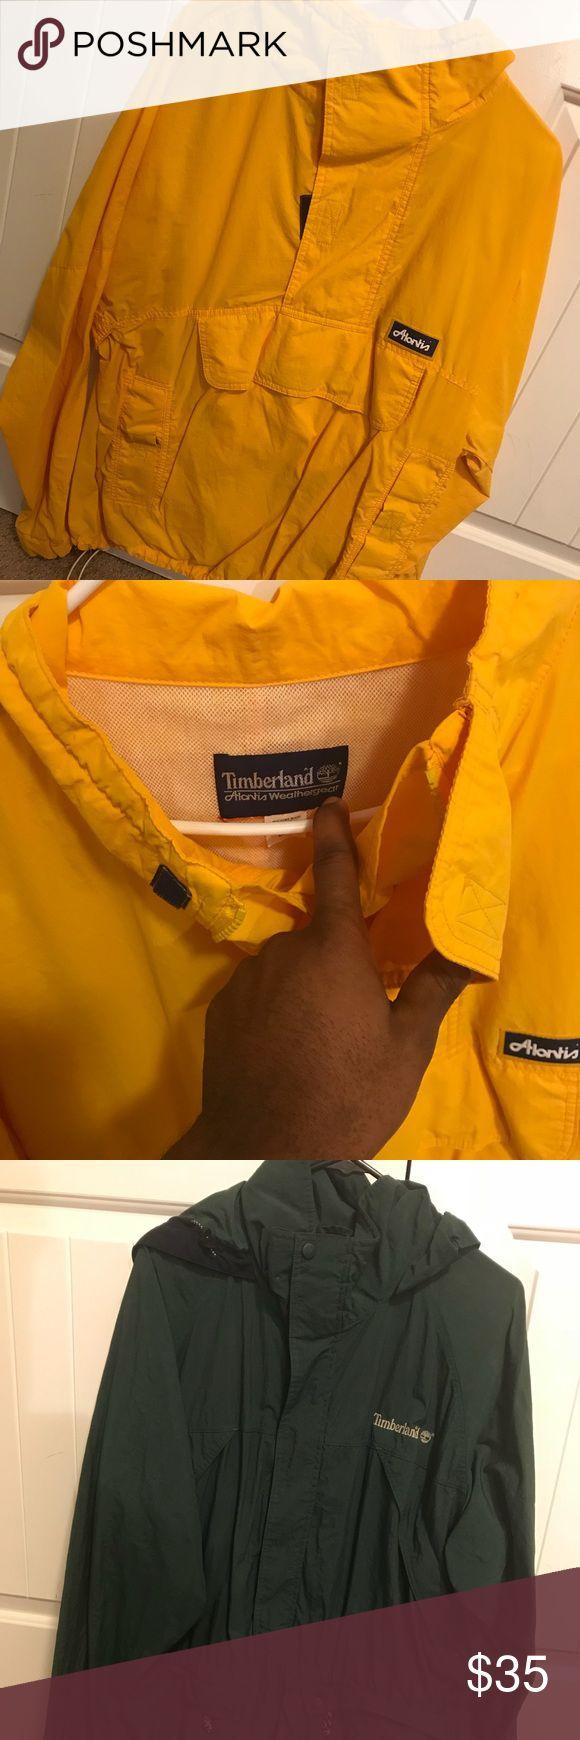 Timberland jackets Both are size Large... good condition! Timberland Jackets & Coats Lightweight & Shirt Jackets